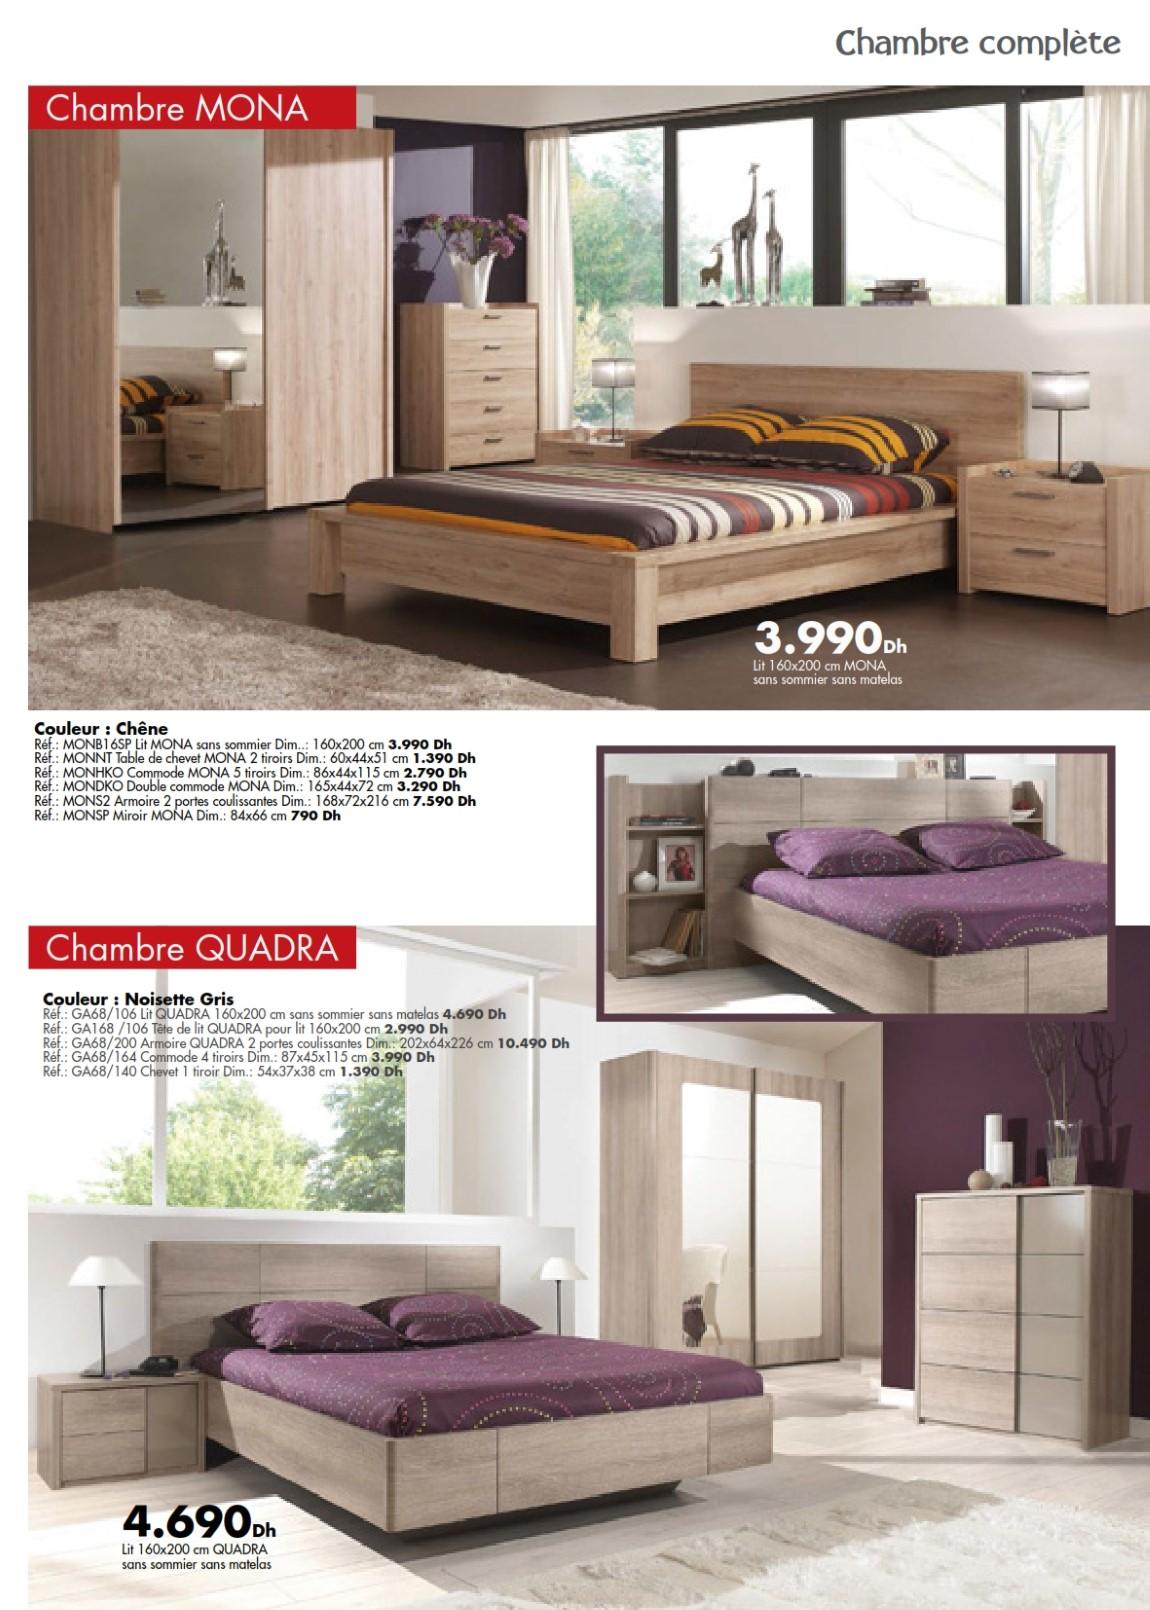 chambre-coucher-2016_015